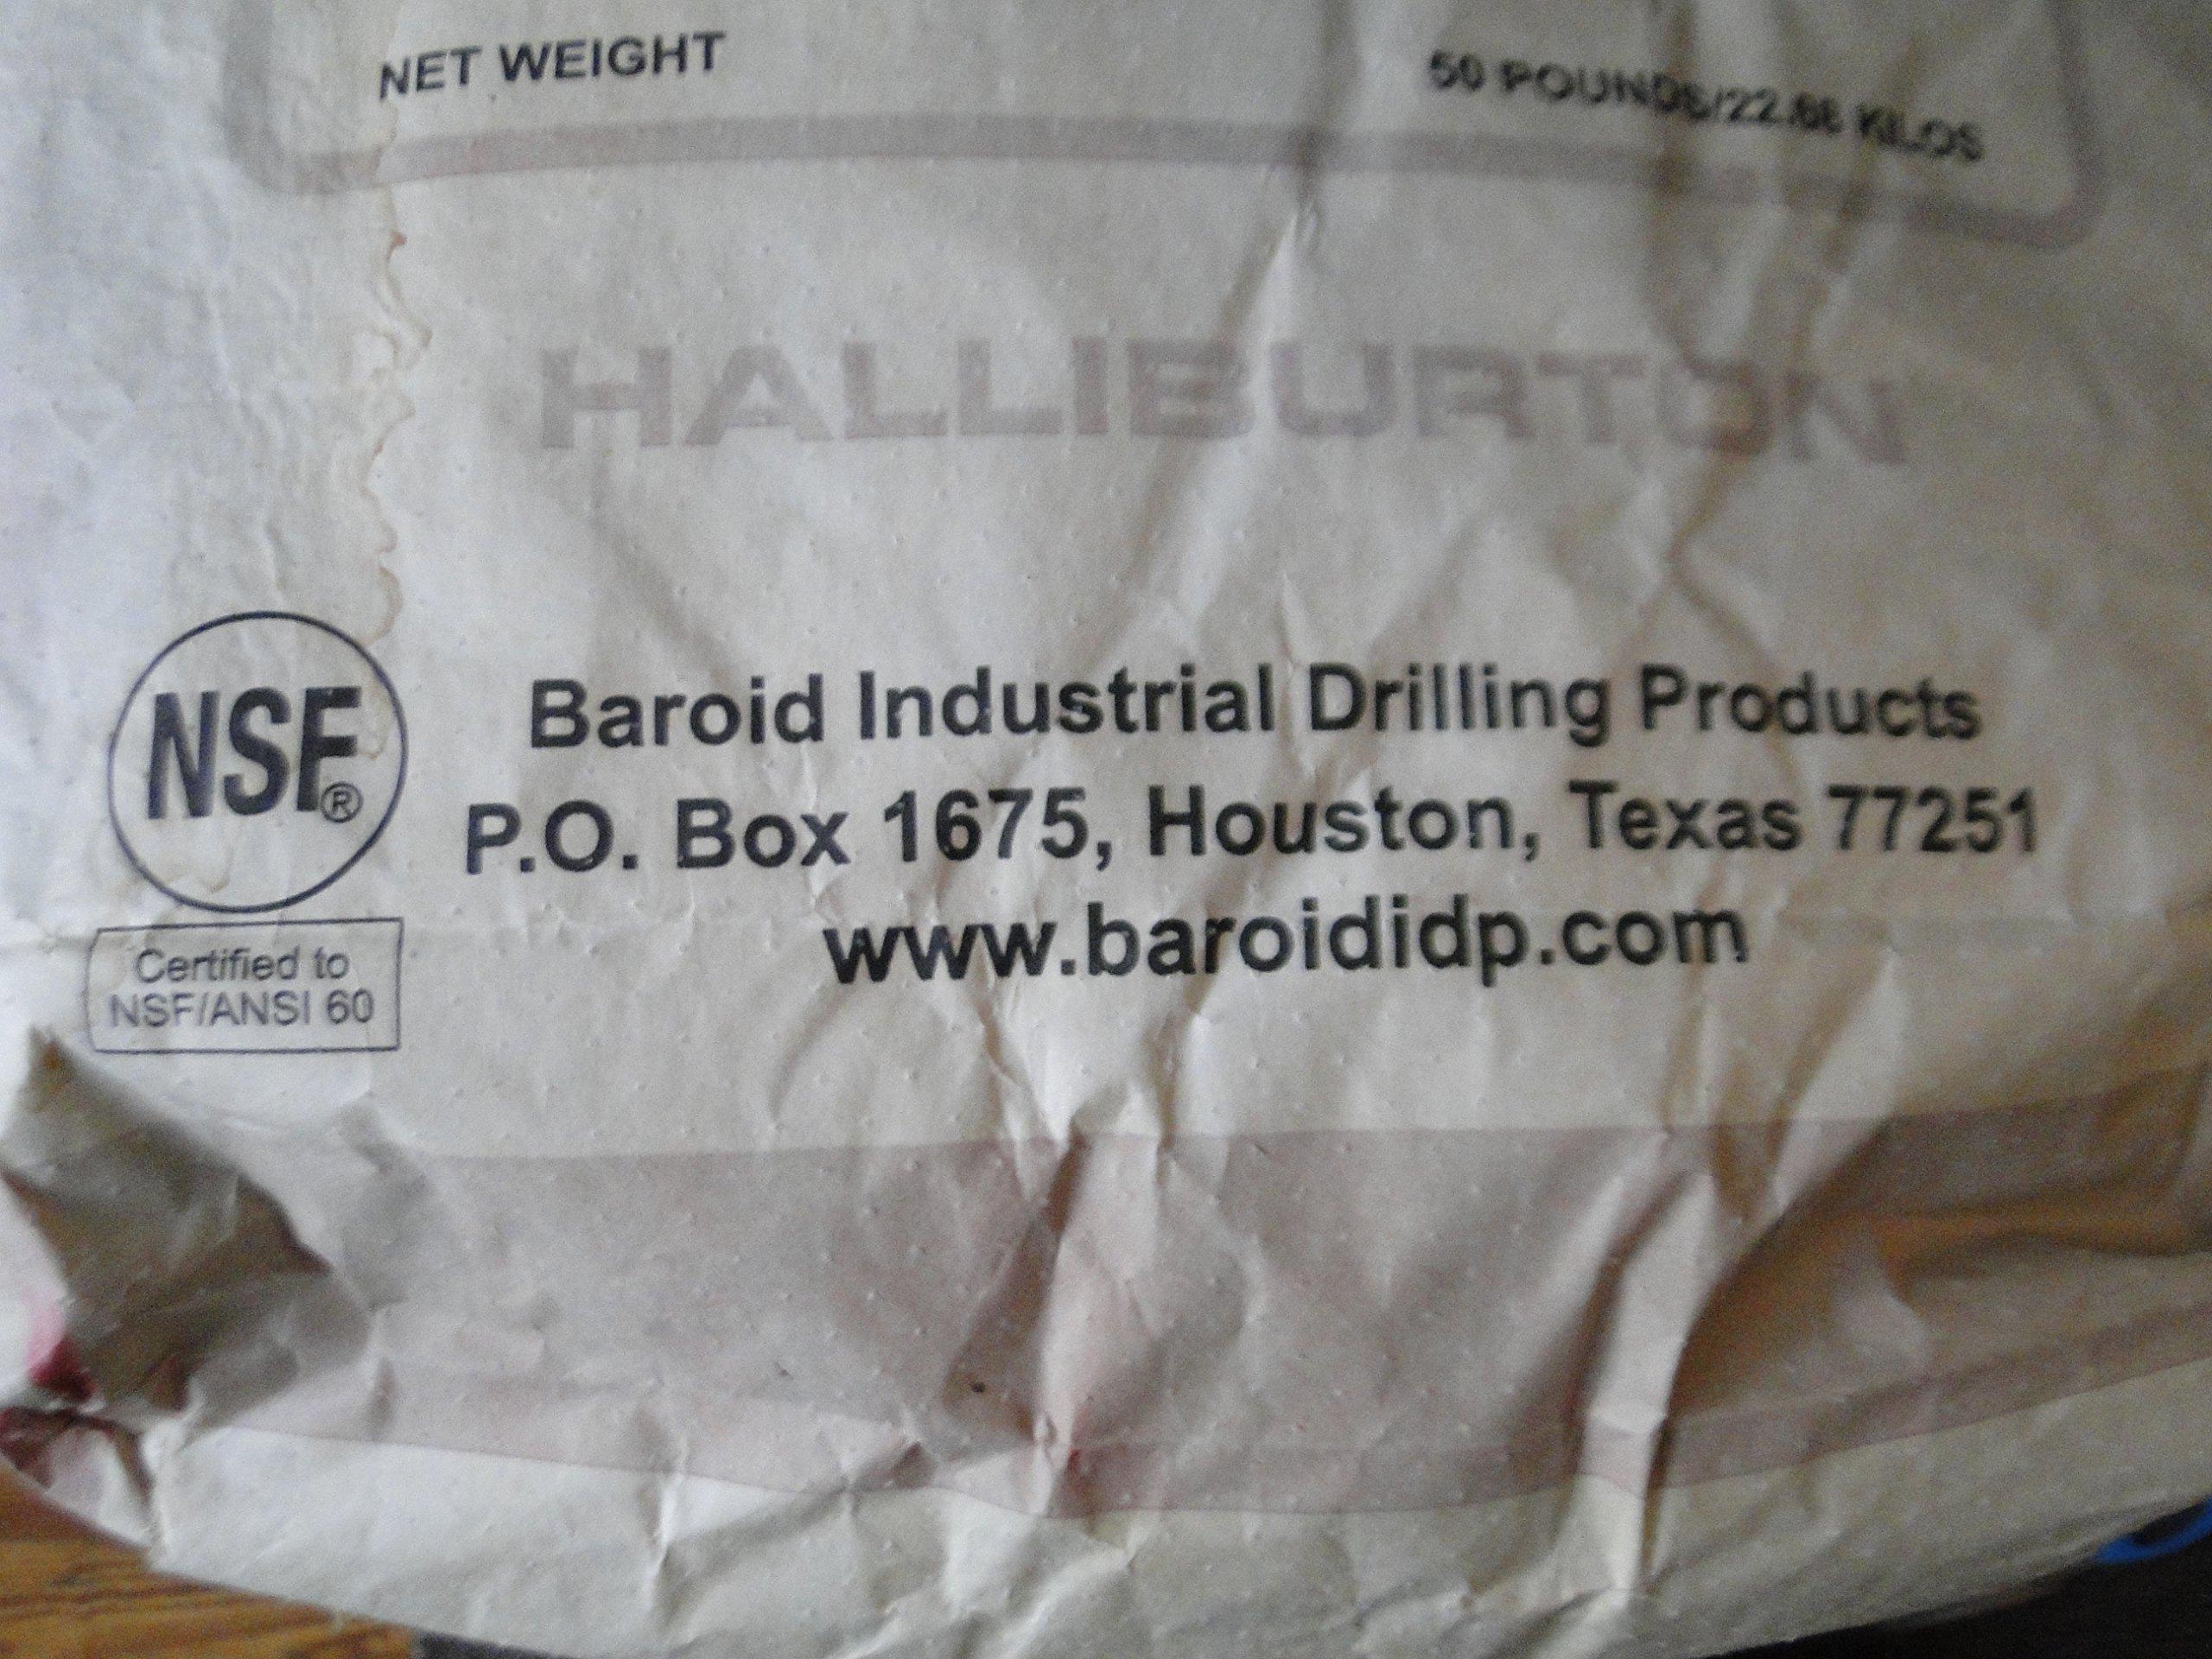 50 Pound Benseal Bentonite Drilling Mud Water Well Pond Foundation Seal Waterproof Baroid Grouting Wyoming Sodium Bentonite by baroid (Image #2)